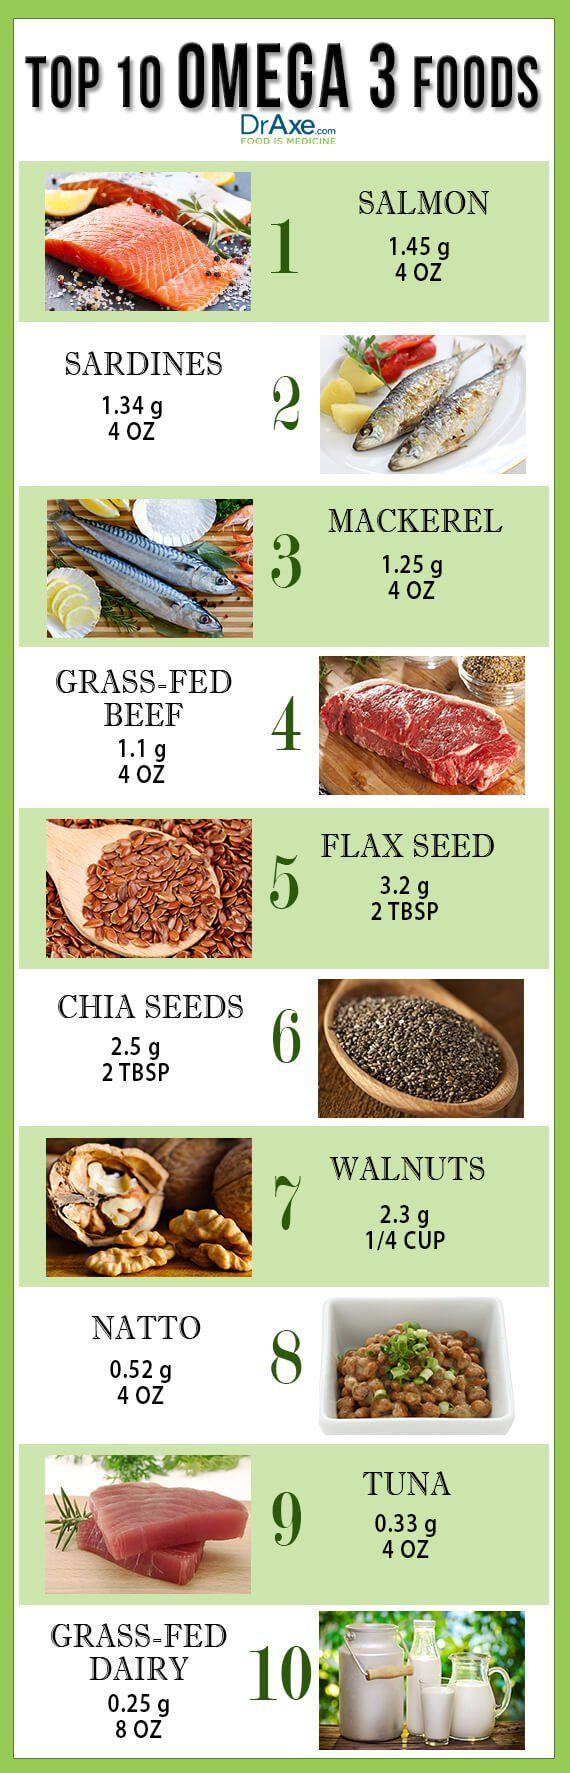 Omega 3 Benefits Plus Top 10 Omega 3 Foods List - DrAxe